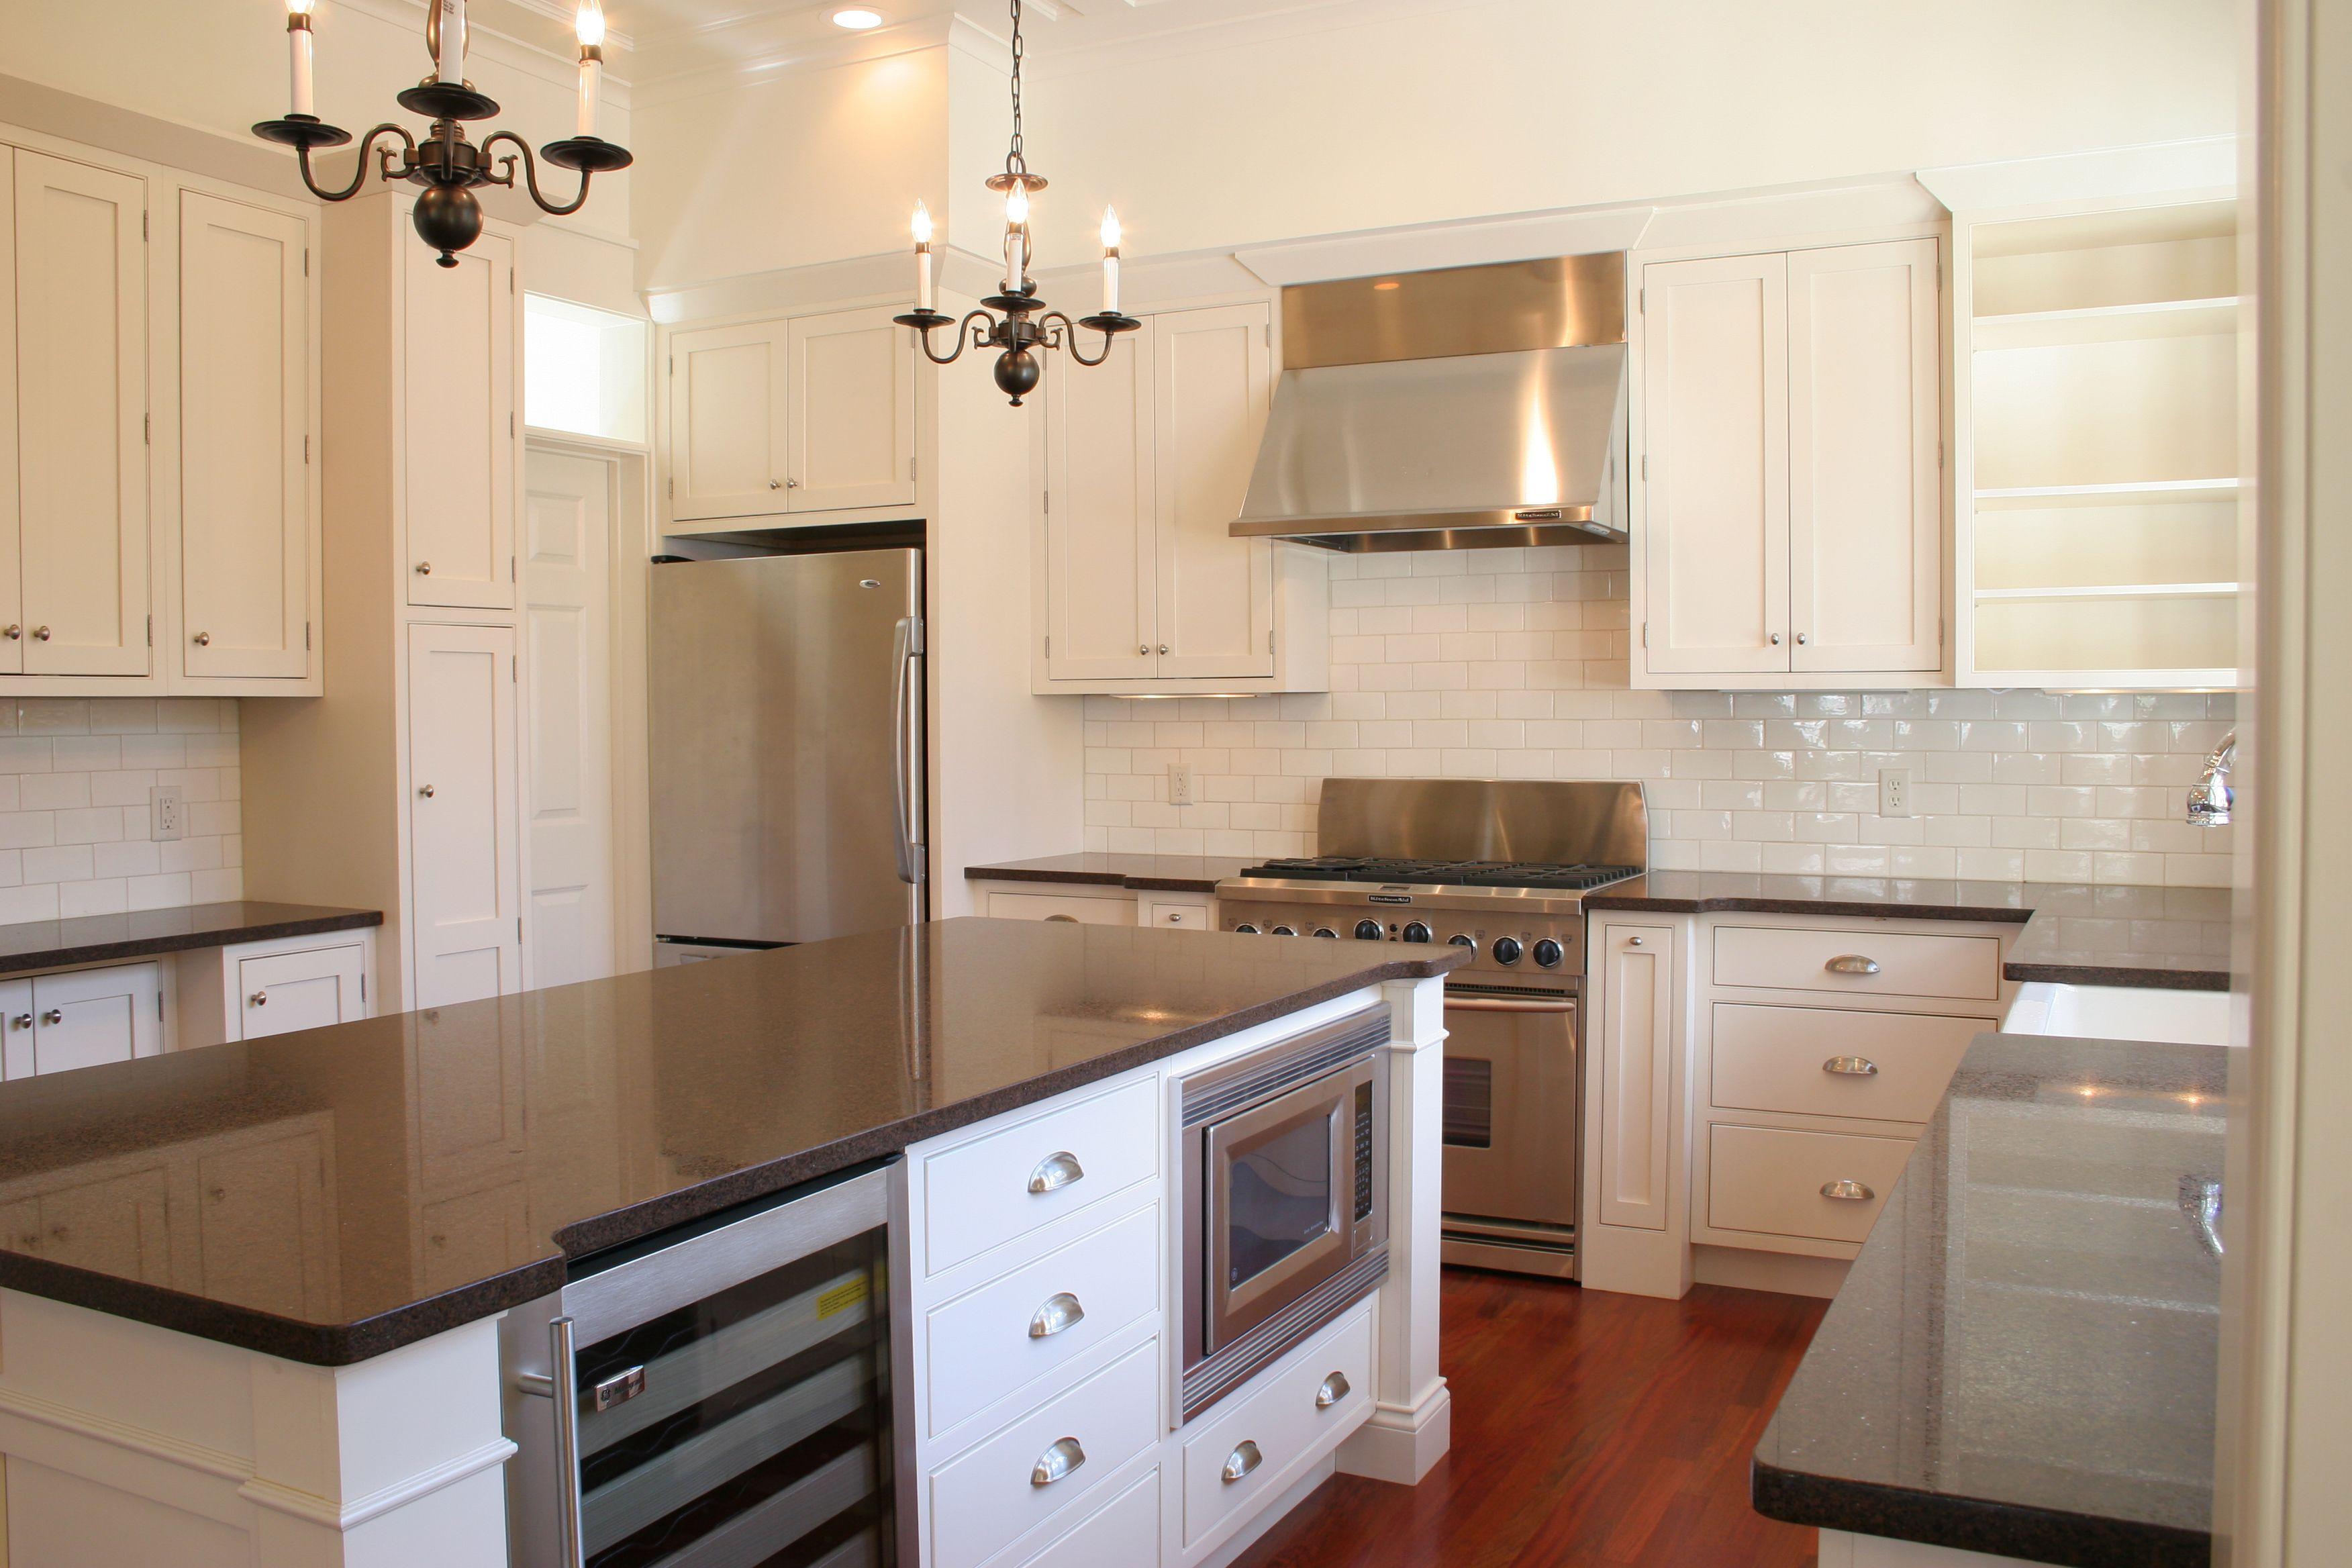 Beautiful White Shaker Kitchen Cabinets Combined With Black Uba Tuba Kitchen Backsplash Inspiration White Shaker Kitchen Cabinets Granite Backsplash Kitchen